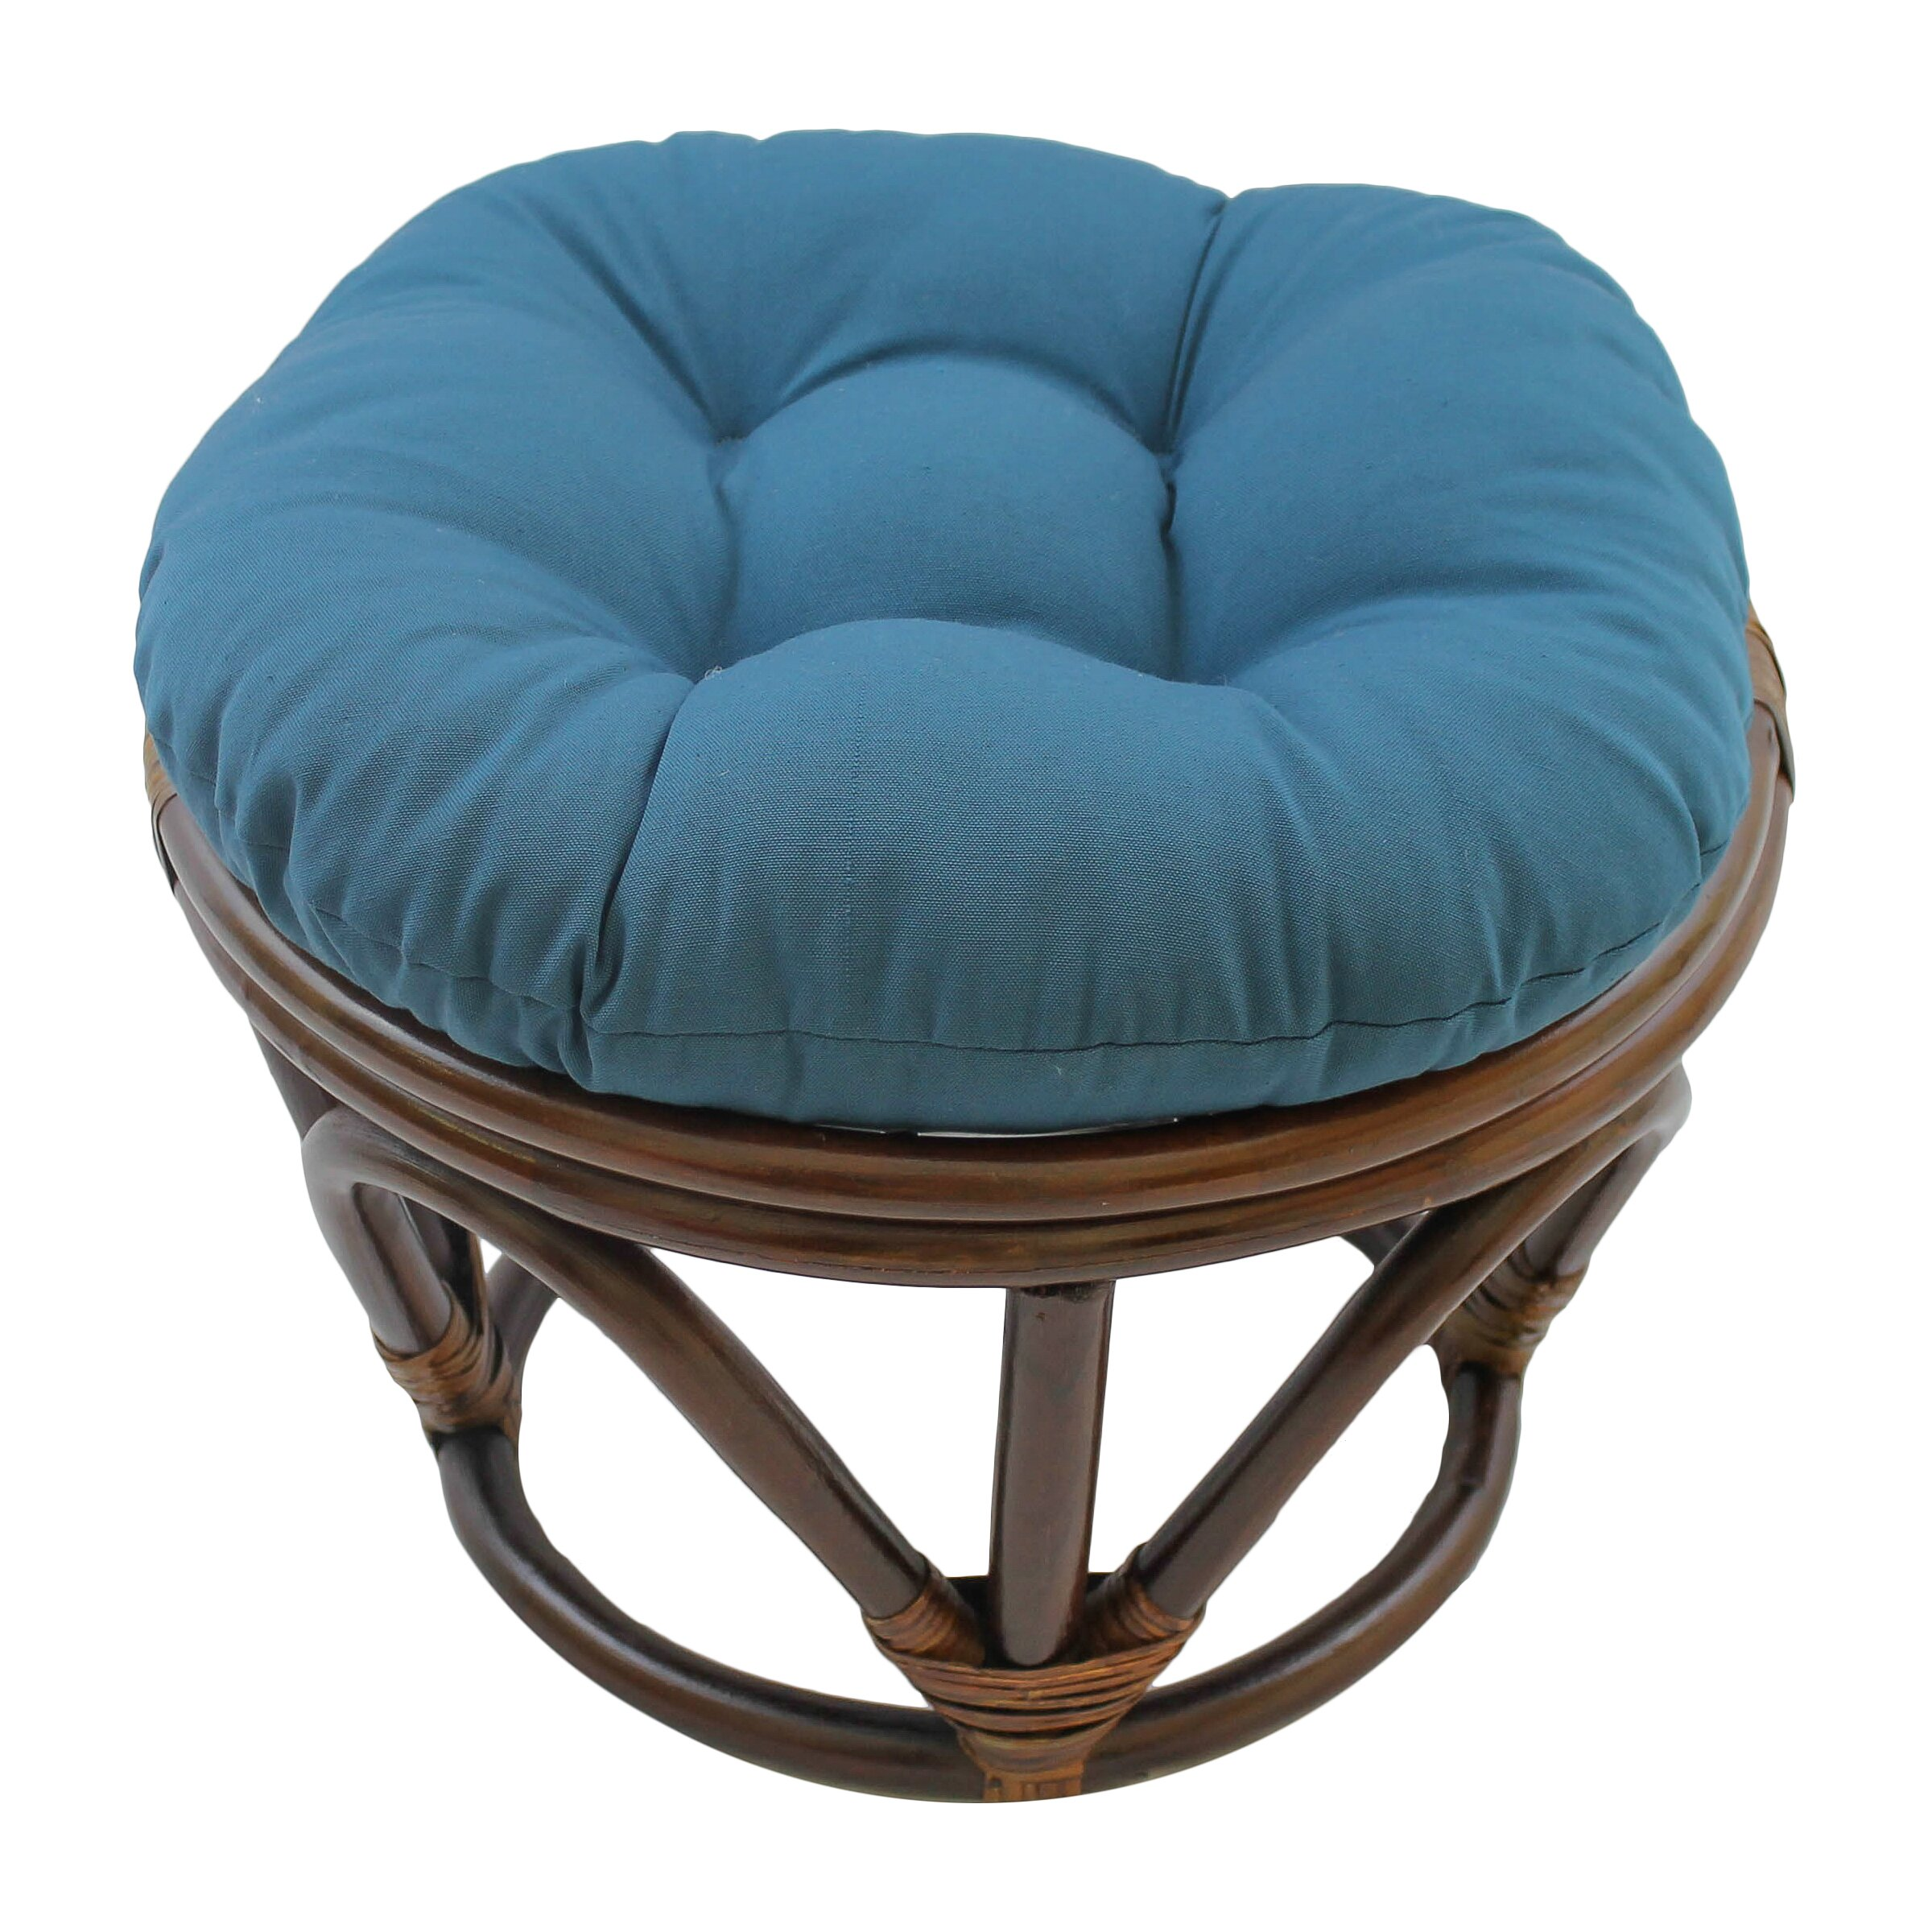 blazing needles papasan ottoman cushion reviews. Black Bedroom Furniture Sets. Home Design Ideas